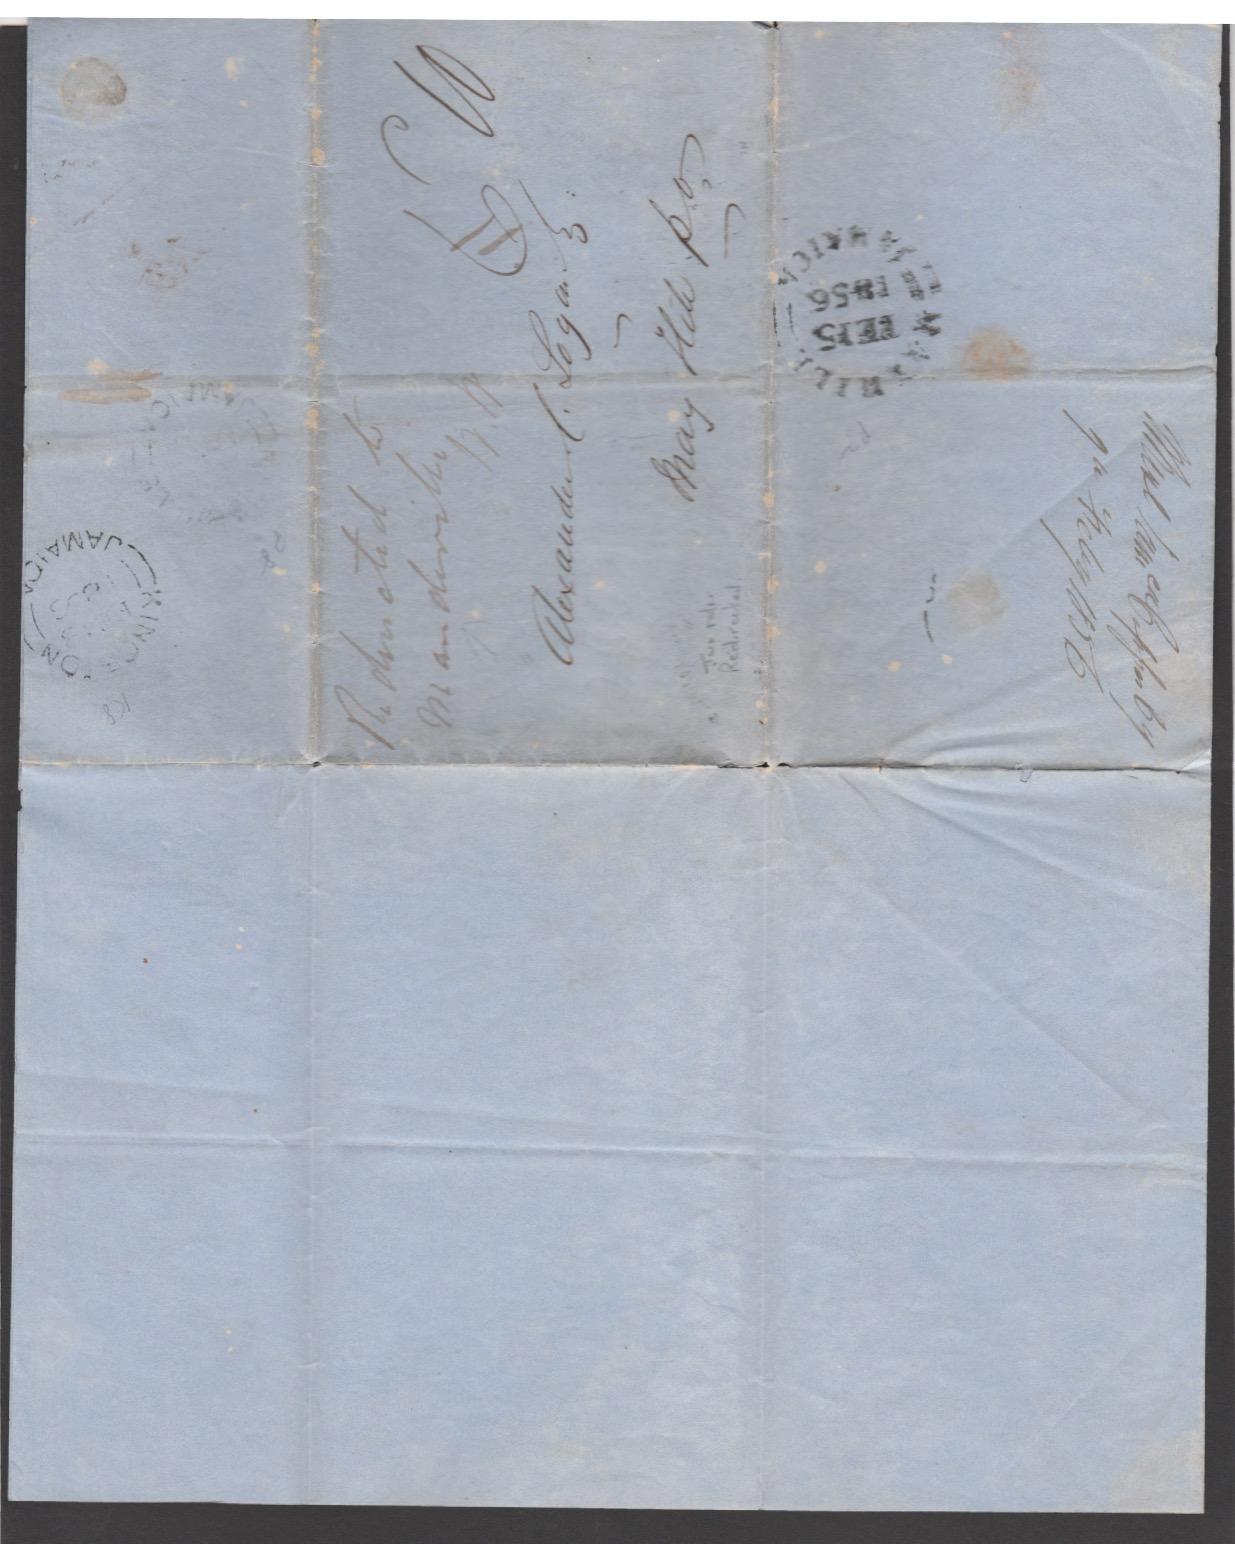 Jamaica 1856 - Image 4 of 4